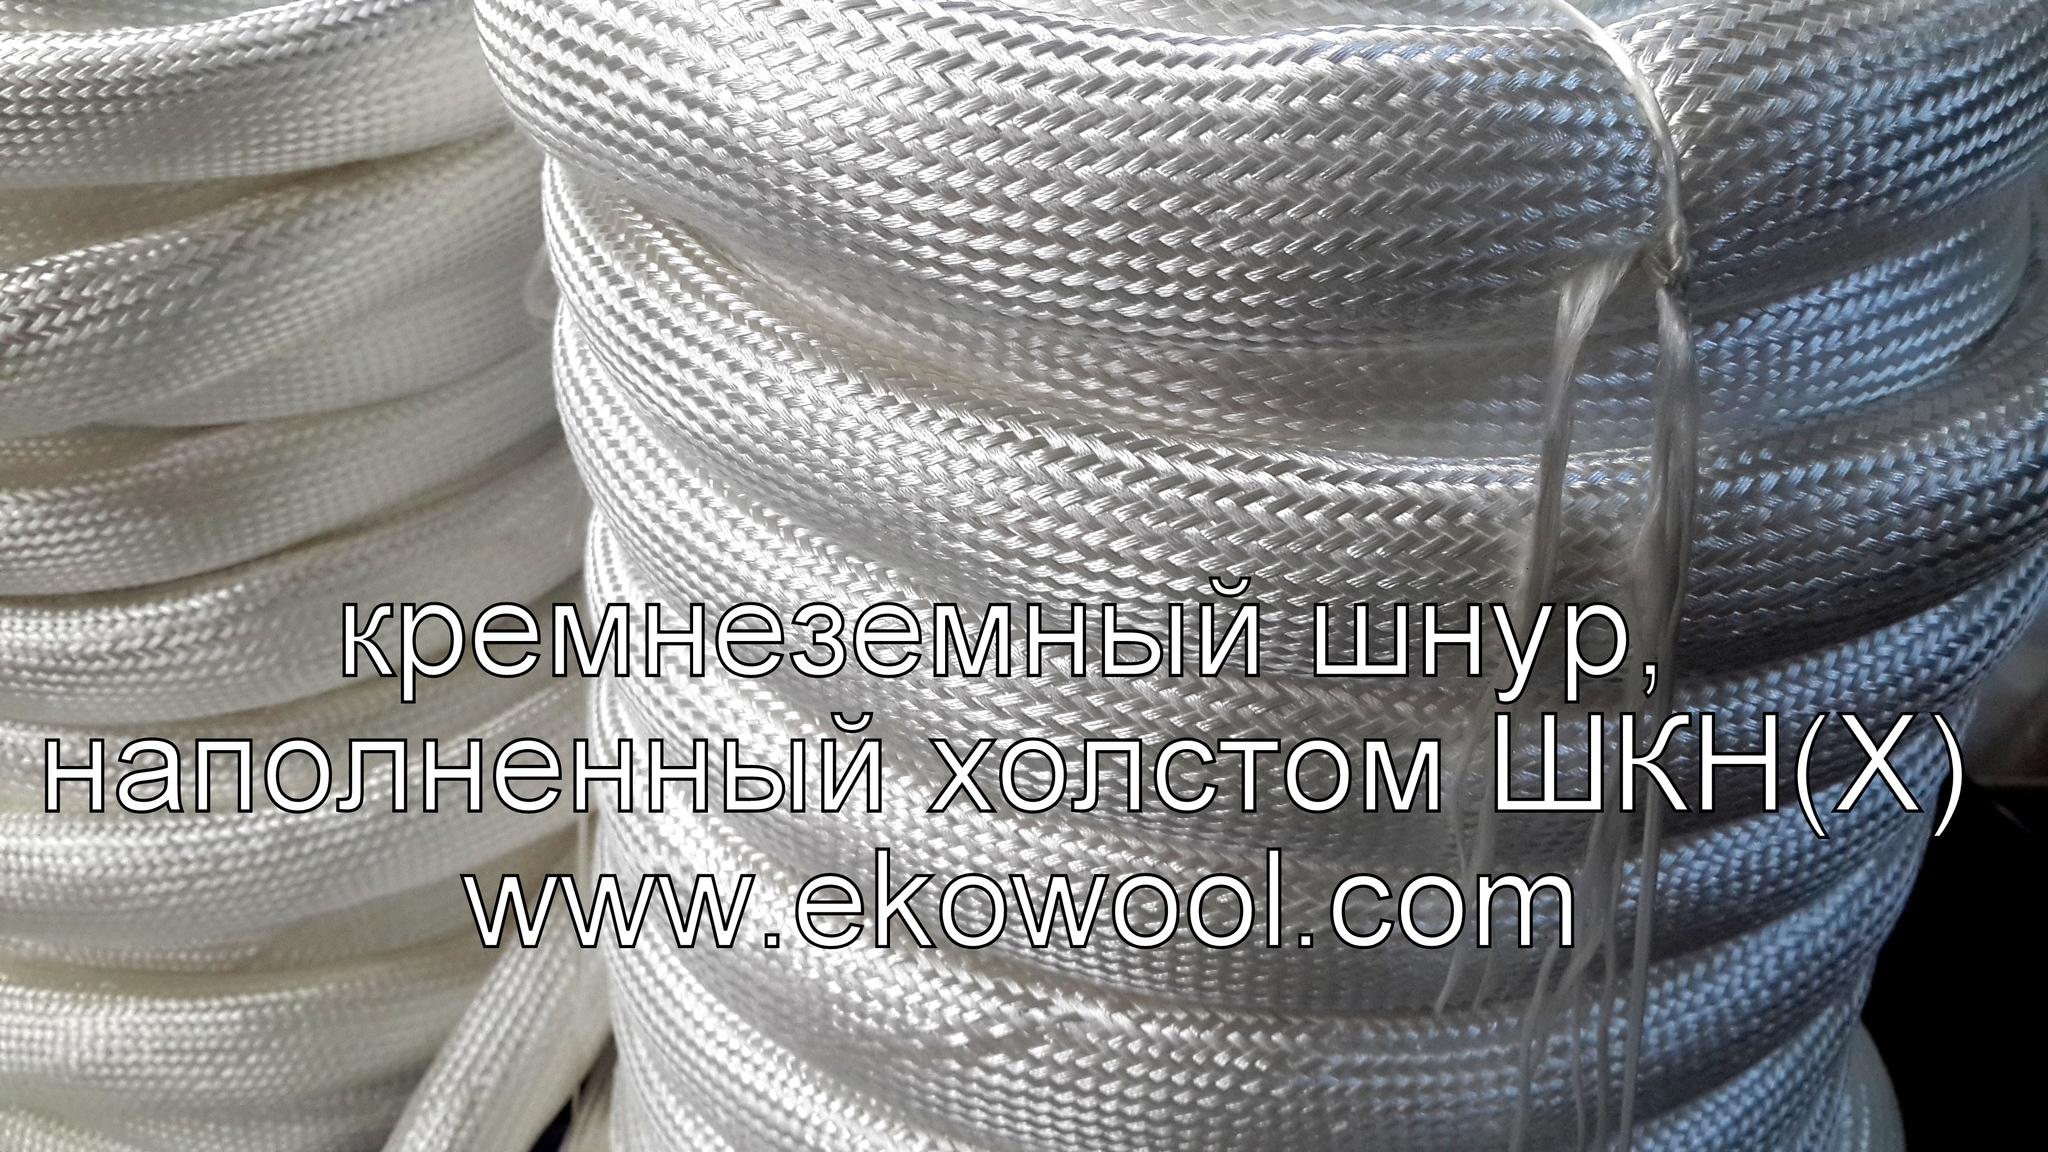 шнур кремнеземный, наполненный холстом ШКН(Х)